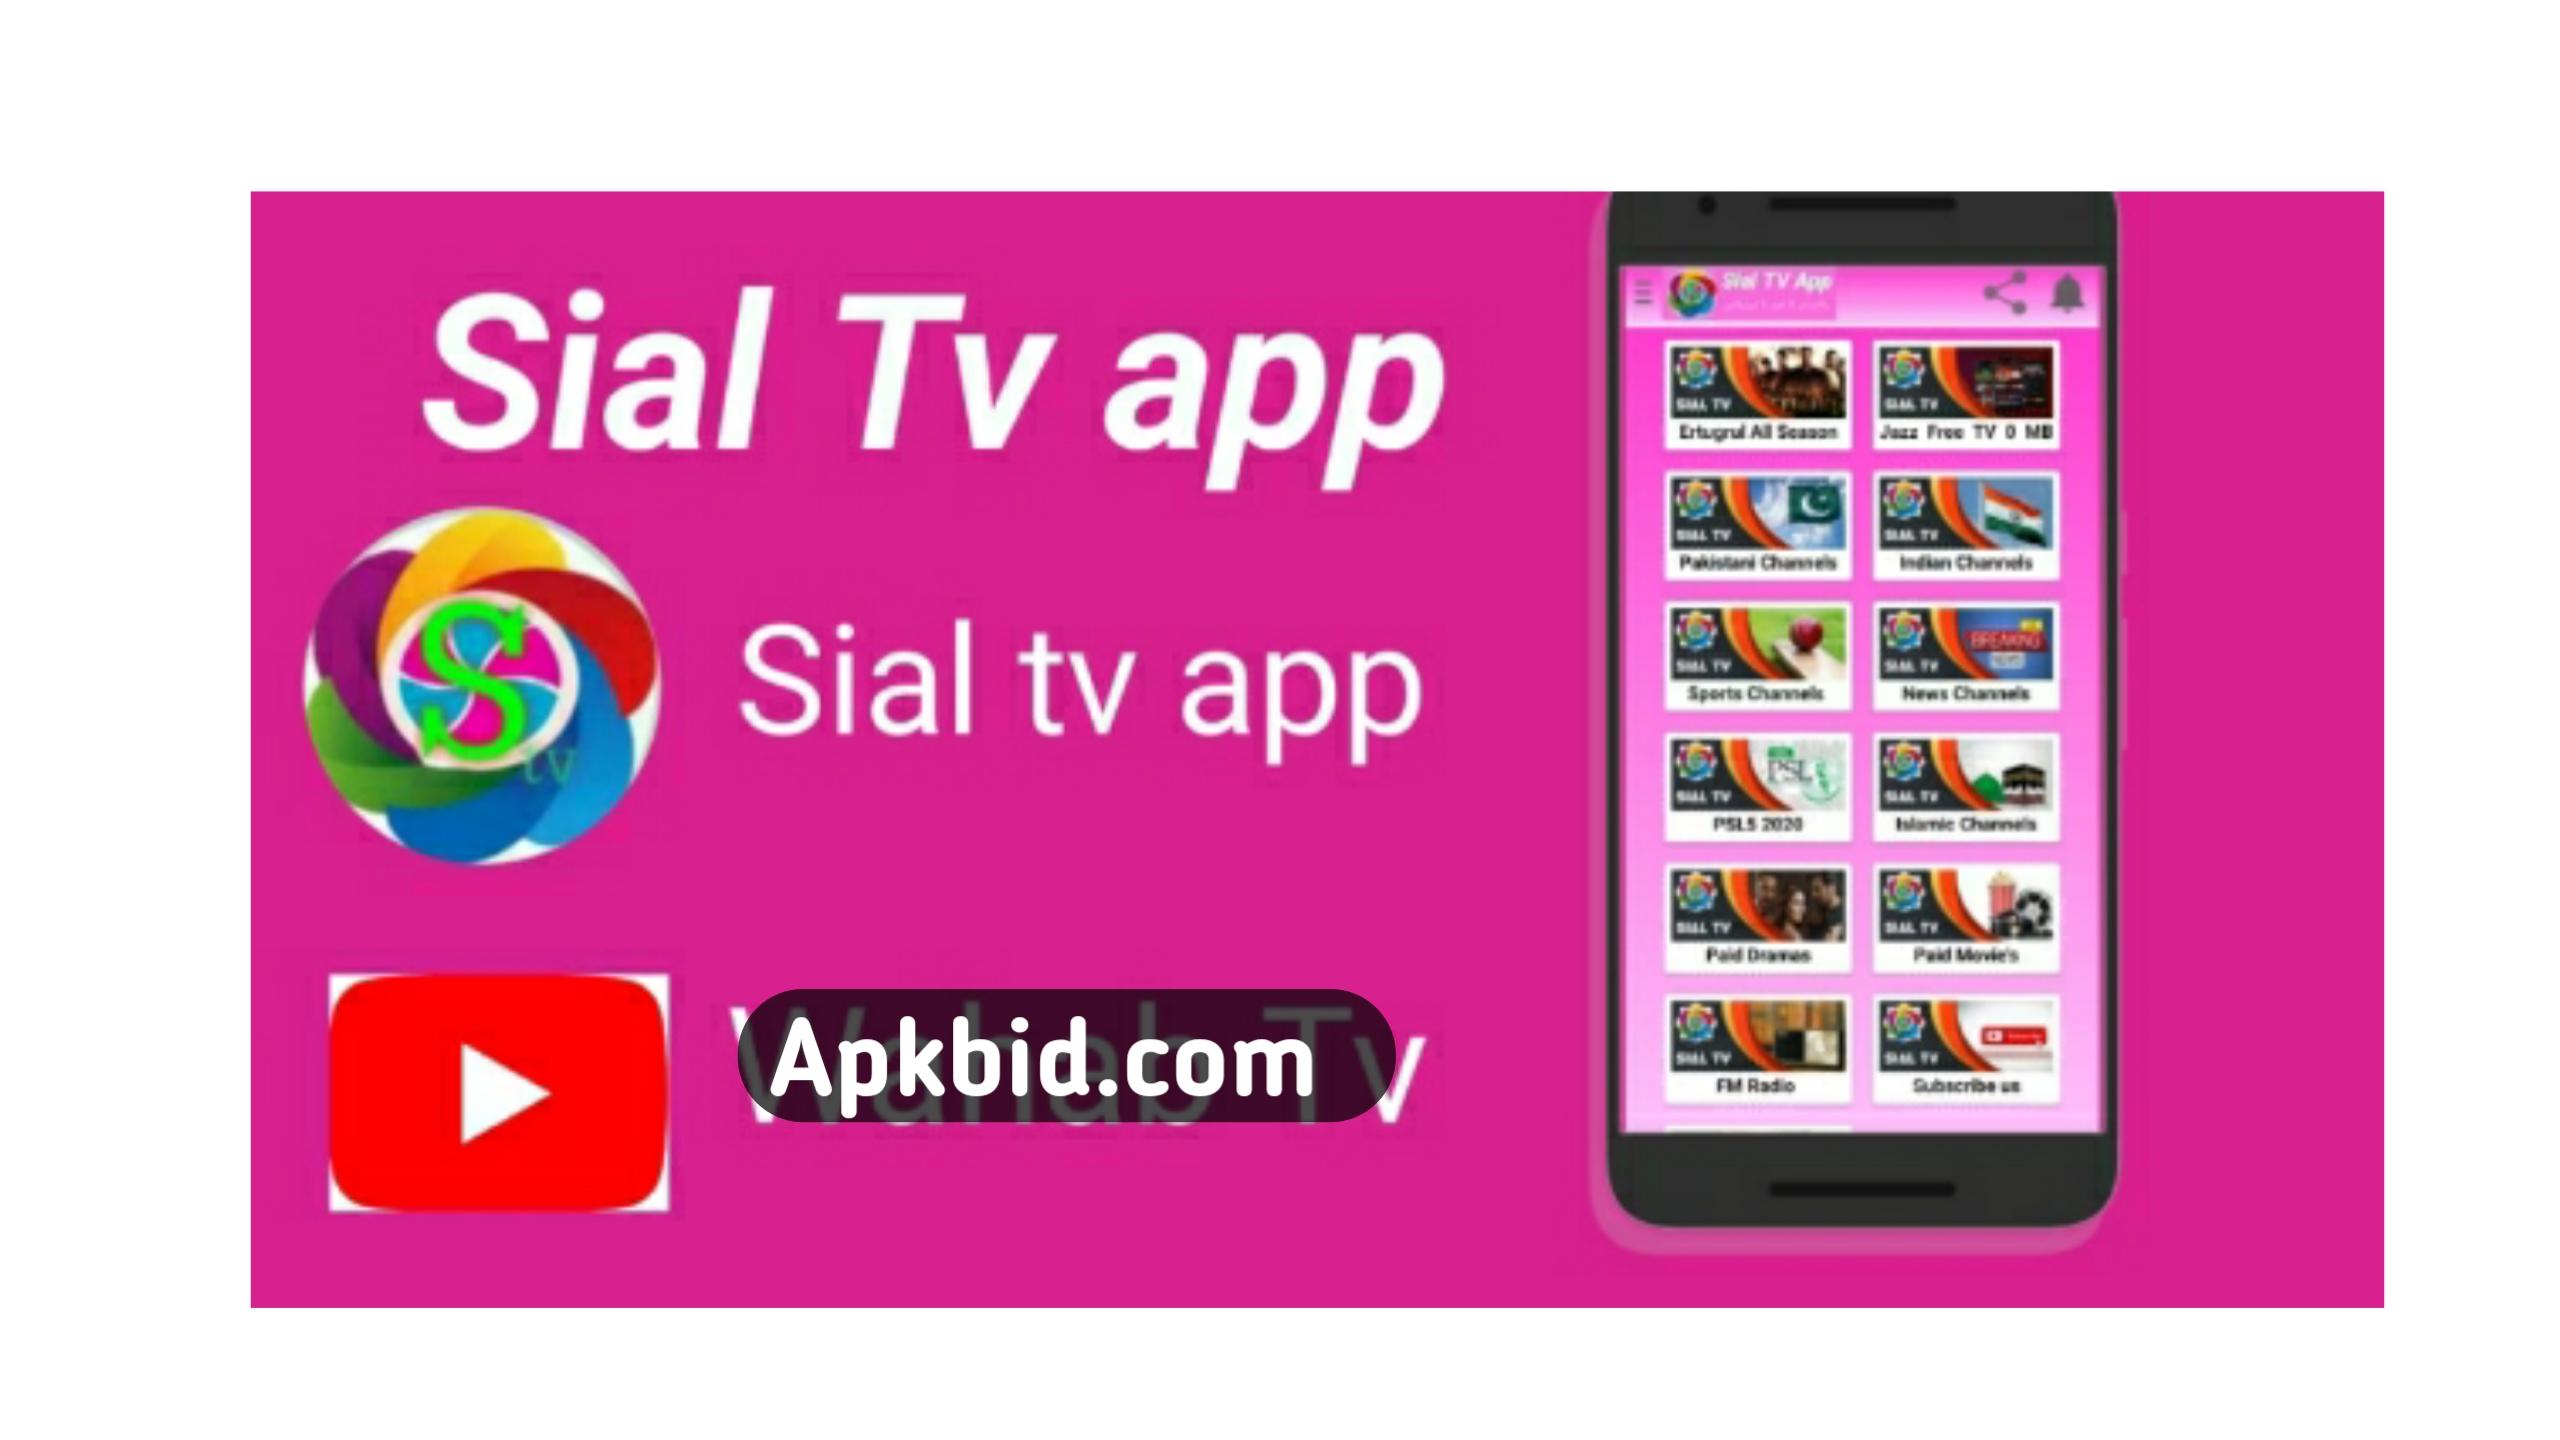 sial tv app